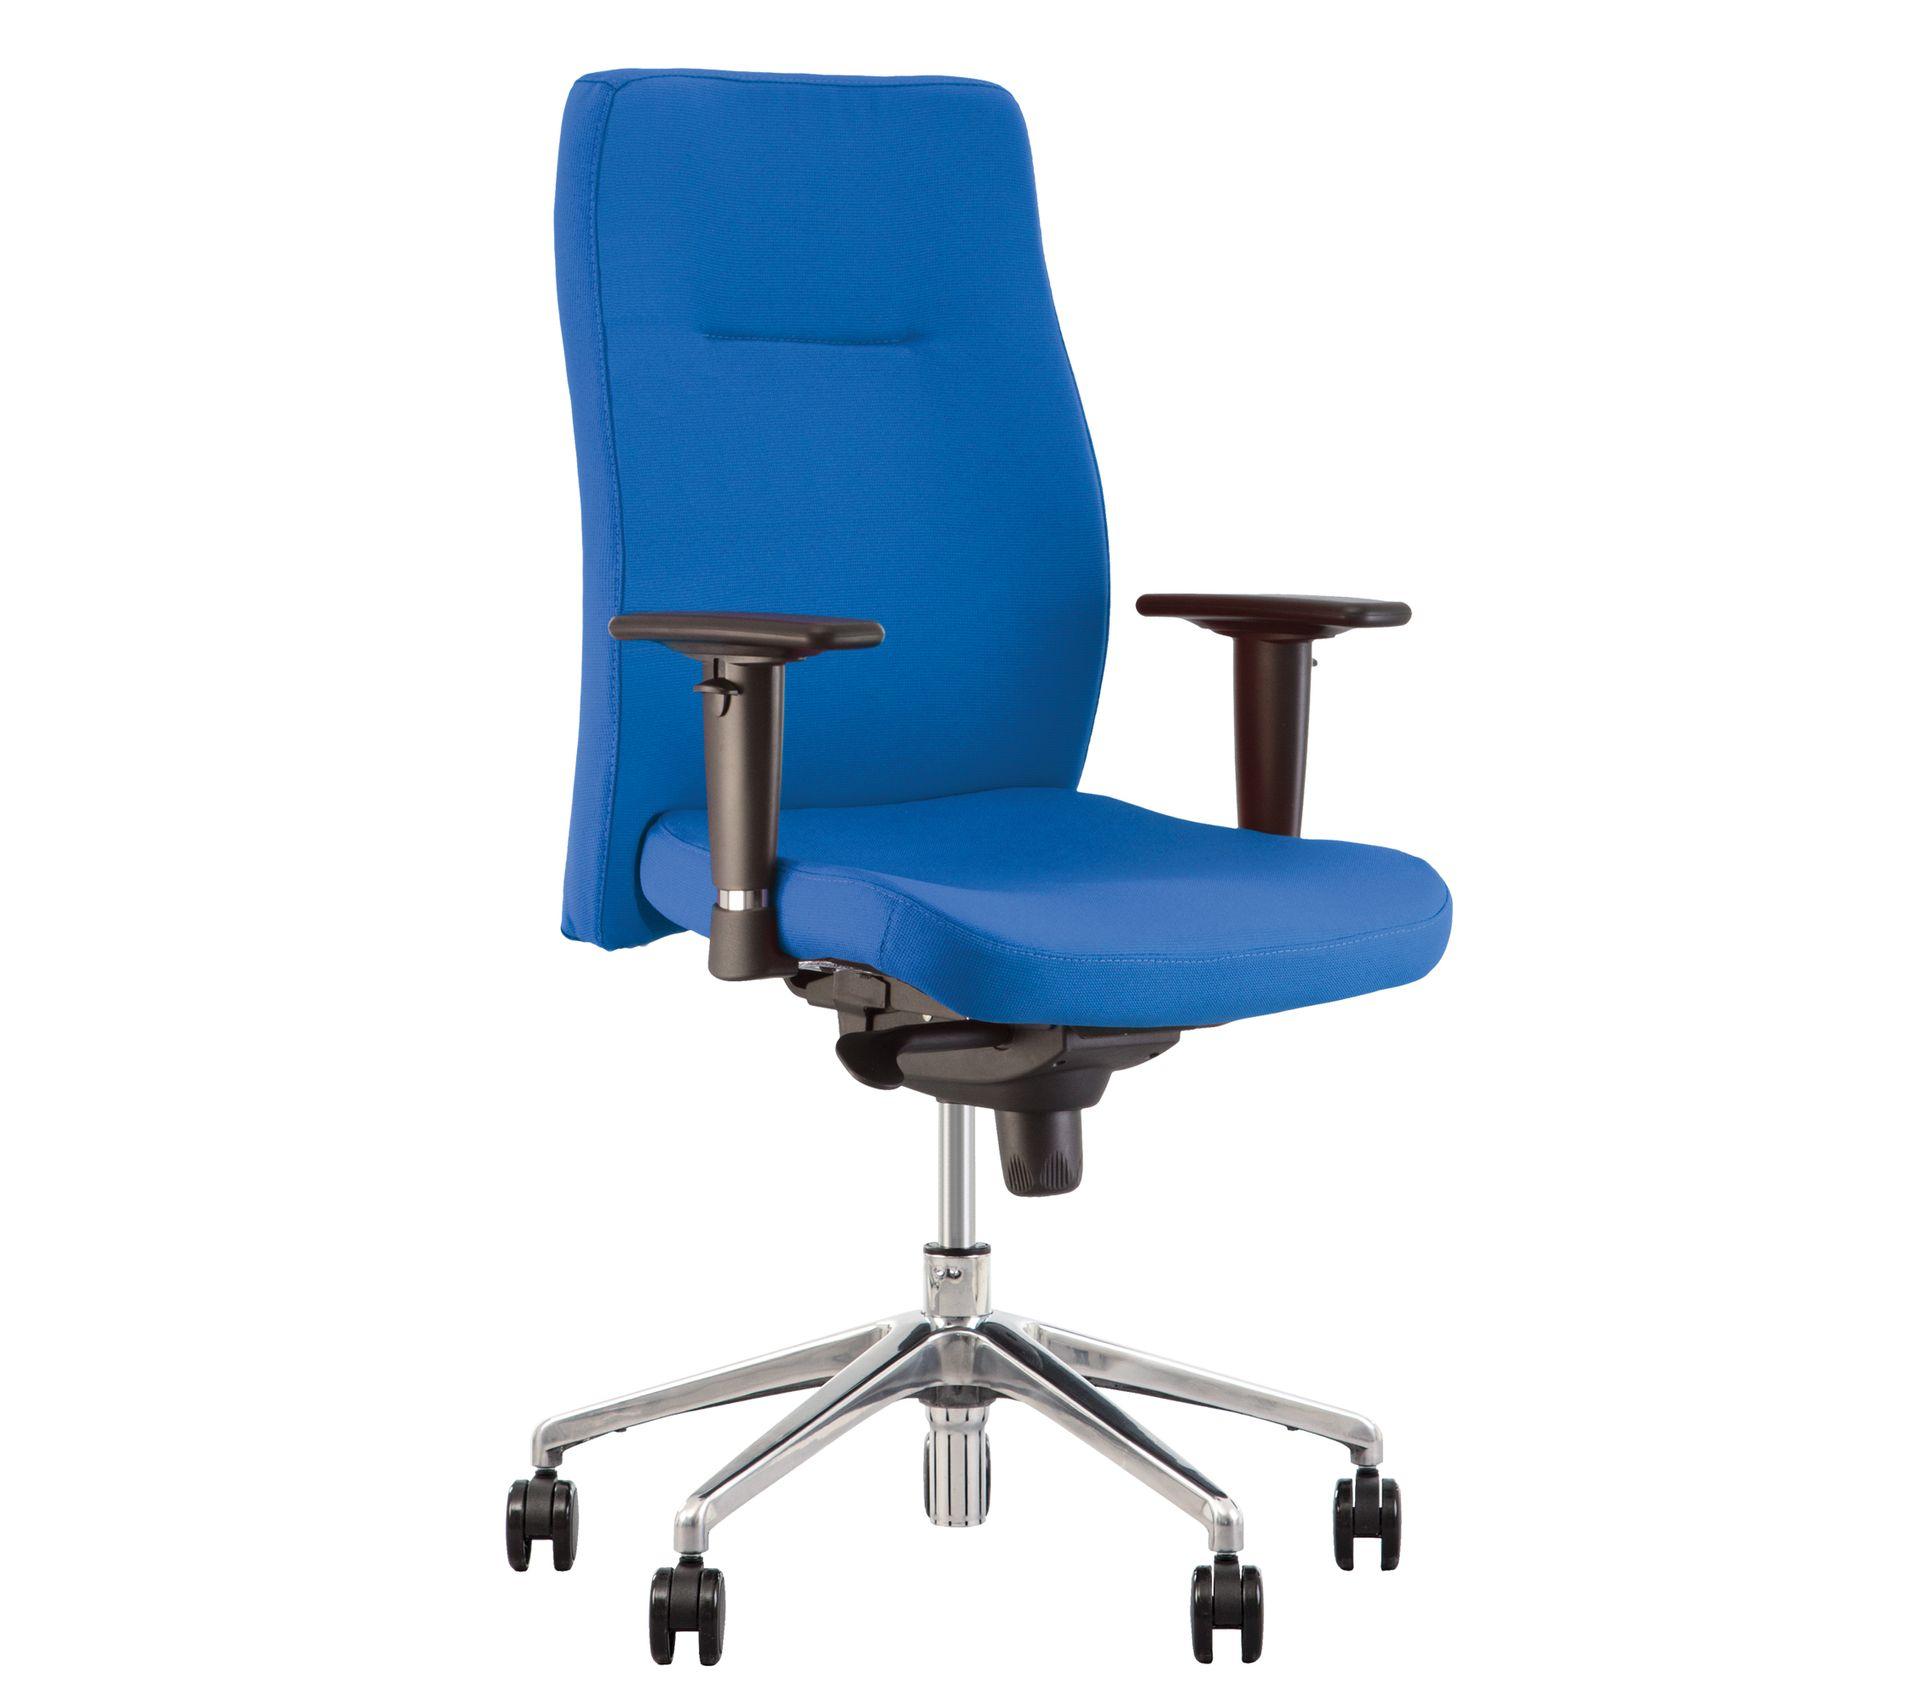 Orlando- Fauteuil, Chaise De Bureau Synchrone, Ergonomique. Bleu.